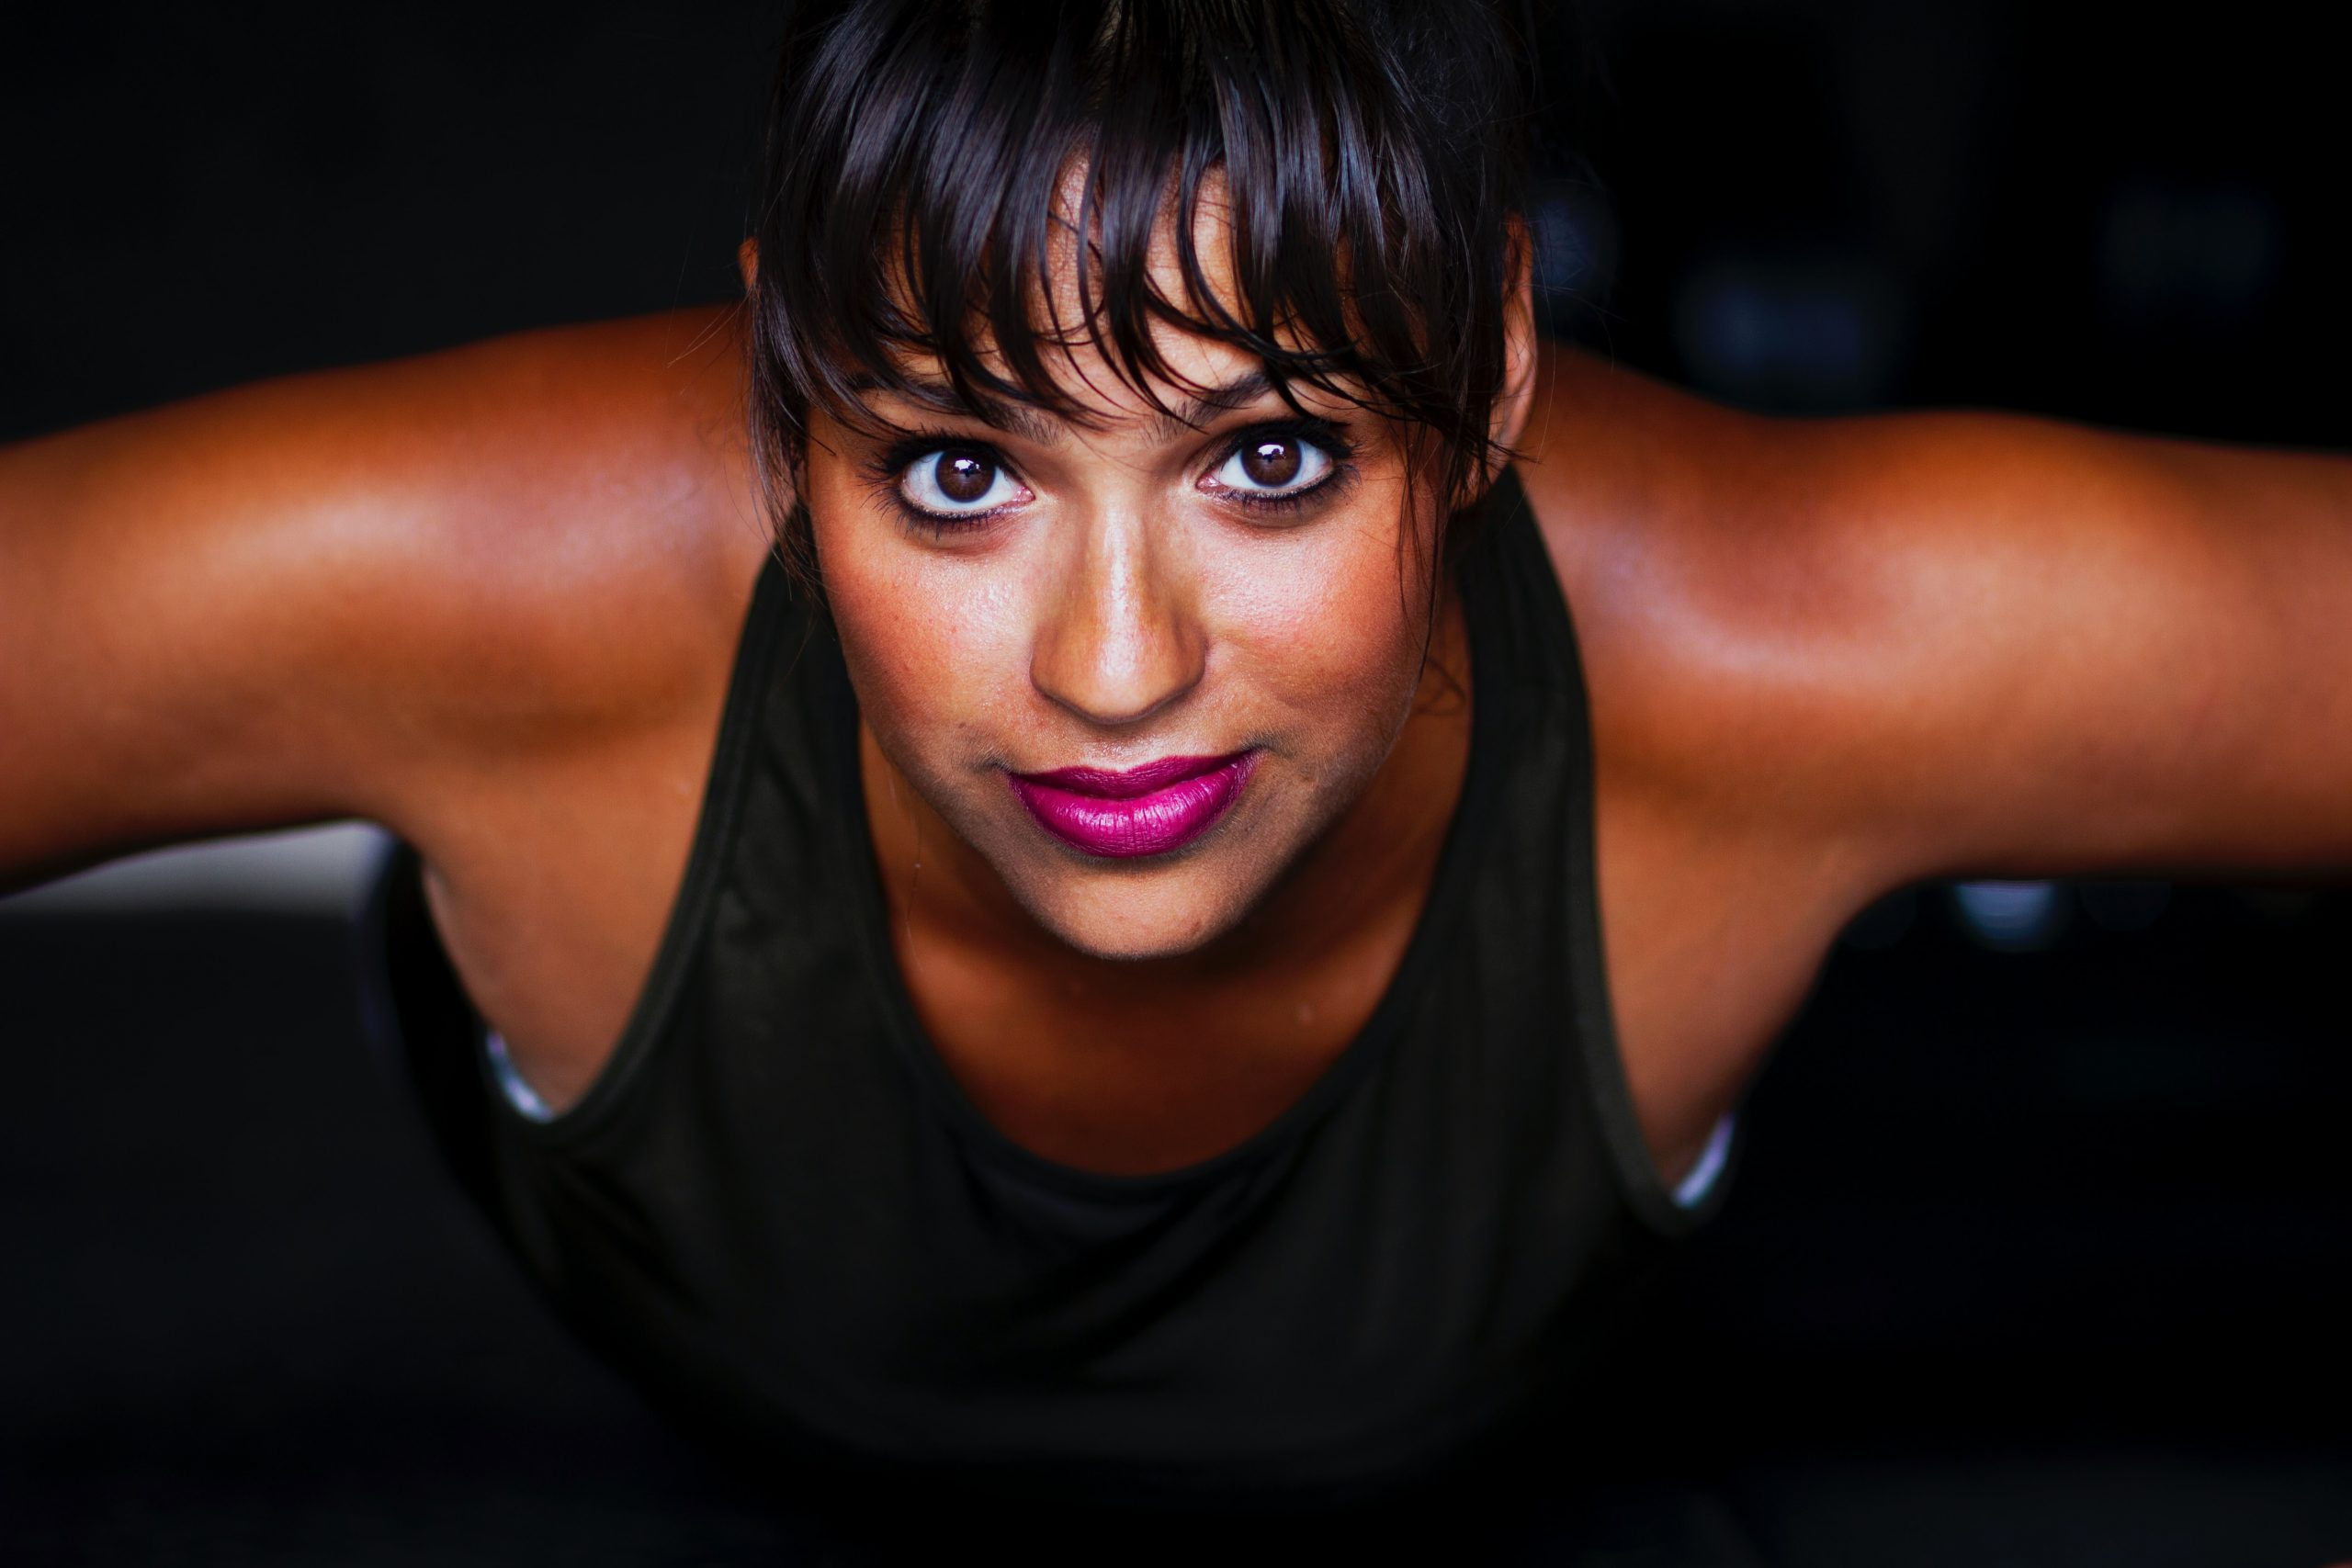 Menstrual Cycle Awareness, Exercise & Food